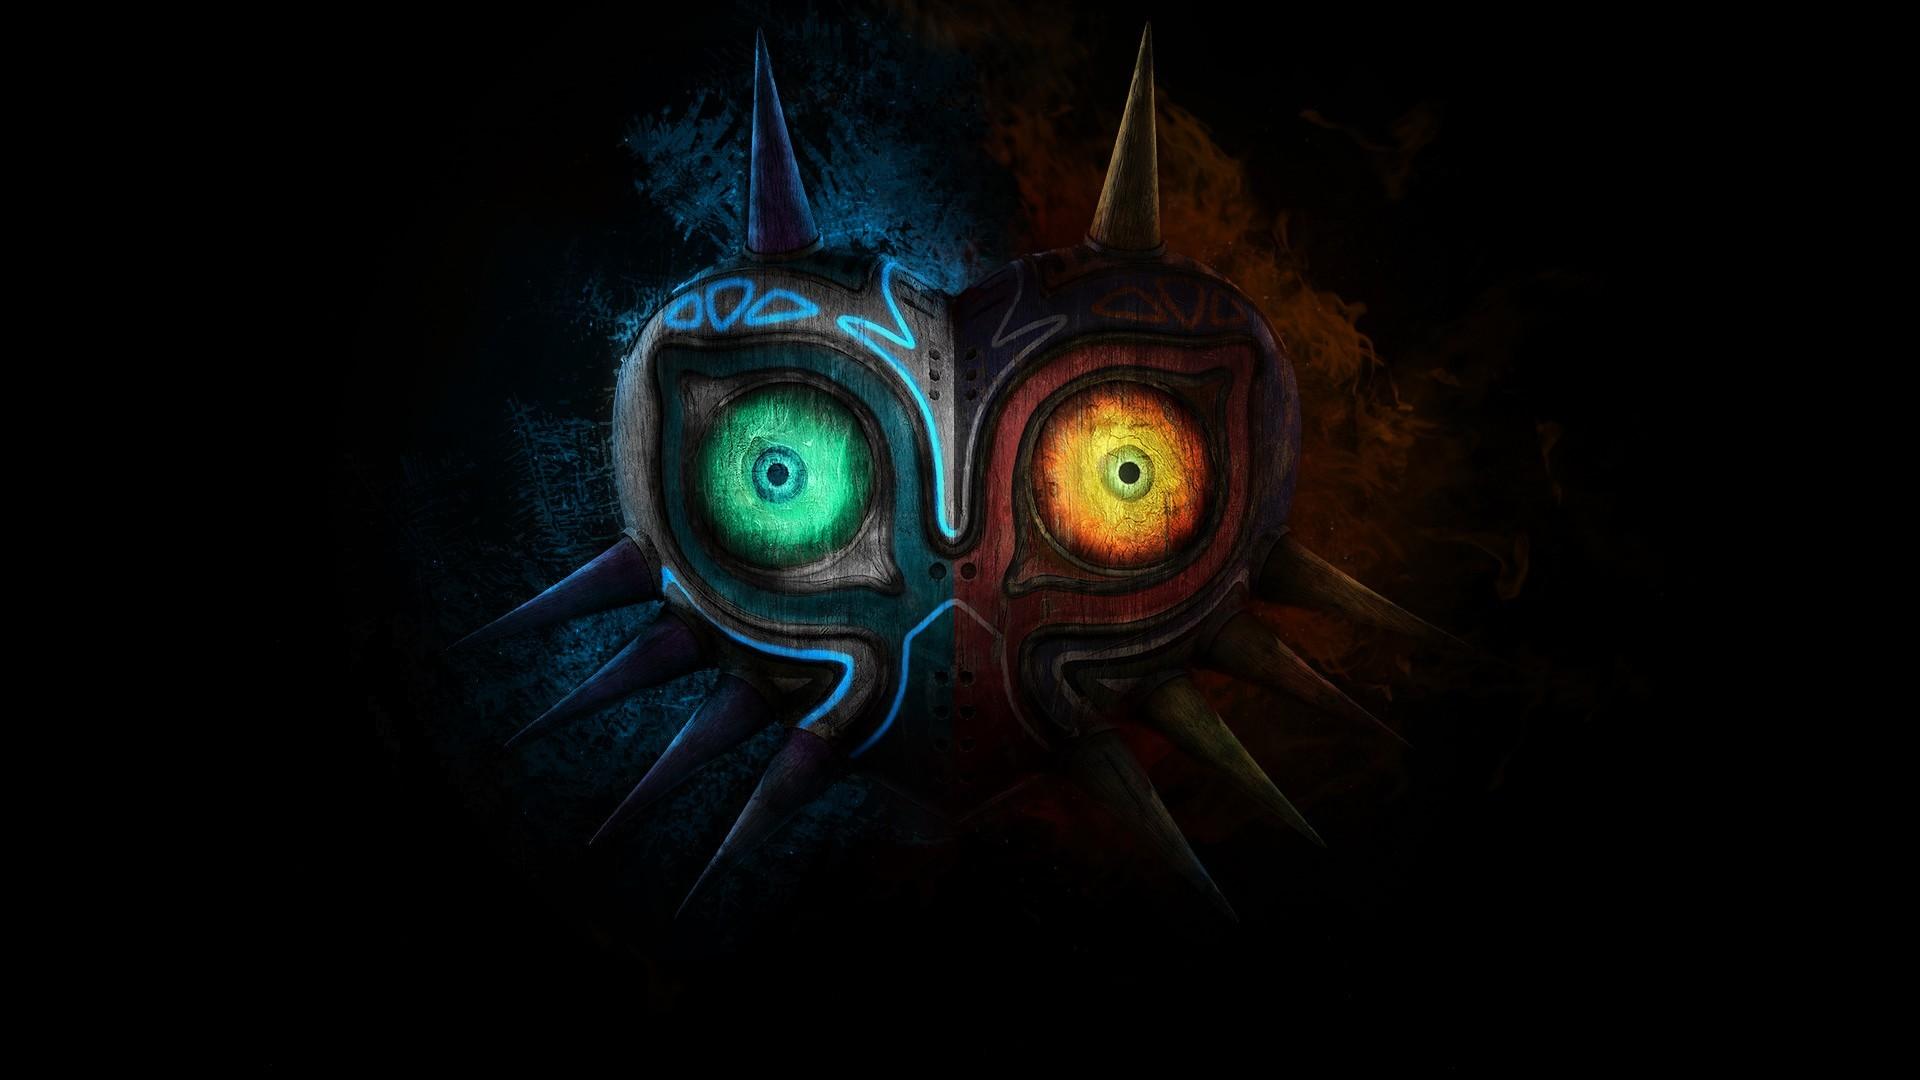 73 The Legend Of Zelda: Majora's Mask HD Wallpapers   Backgrounds –  Wallpaper Abyss